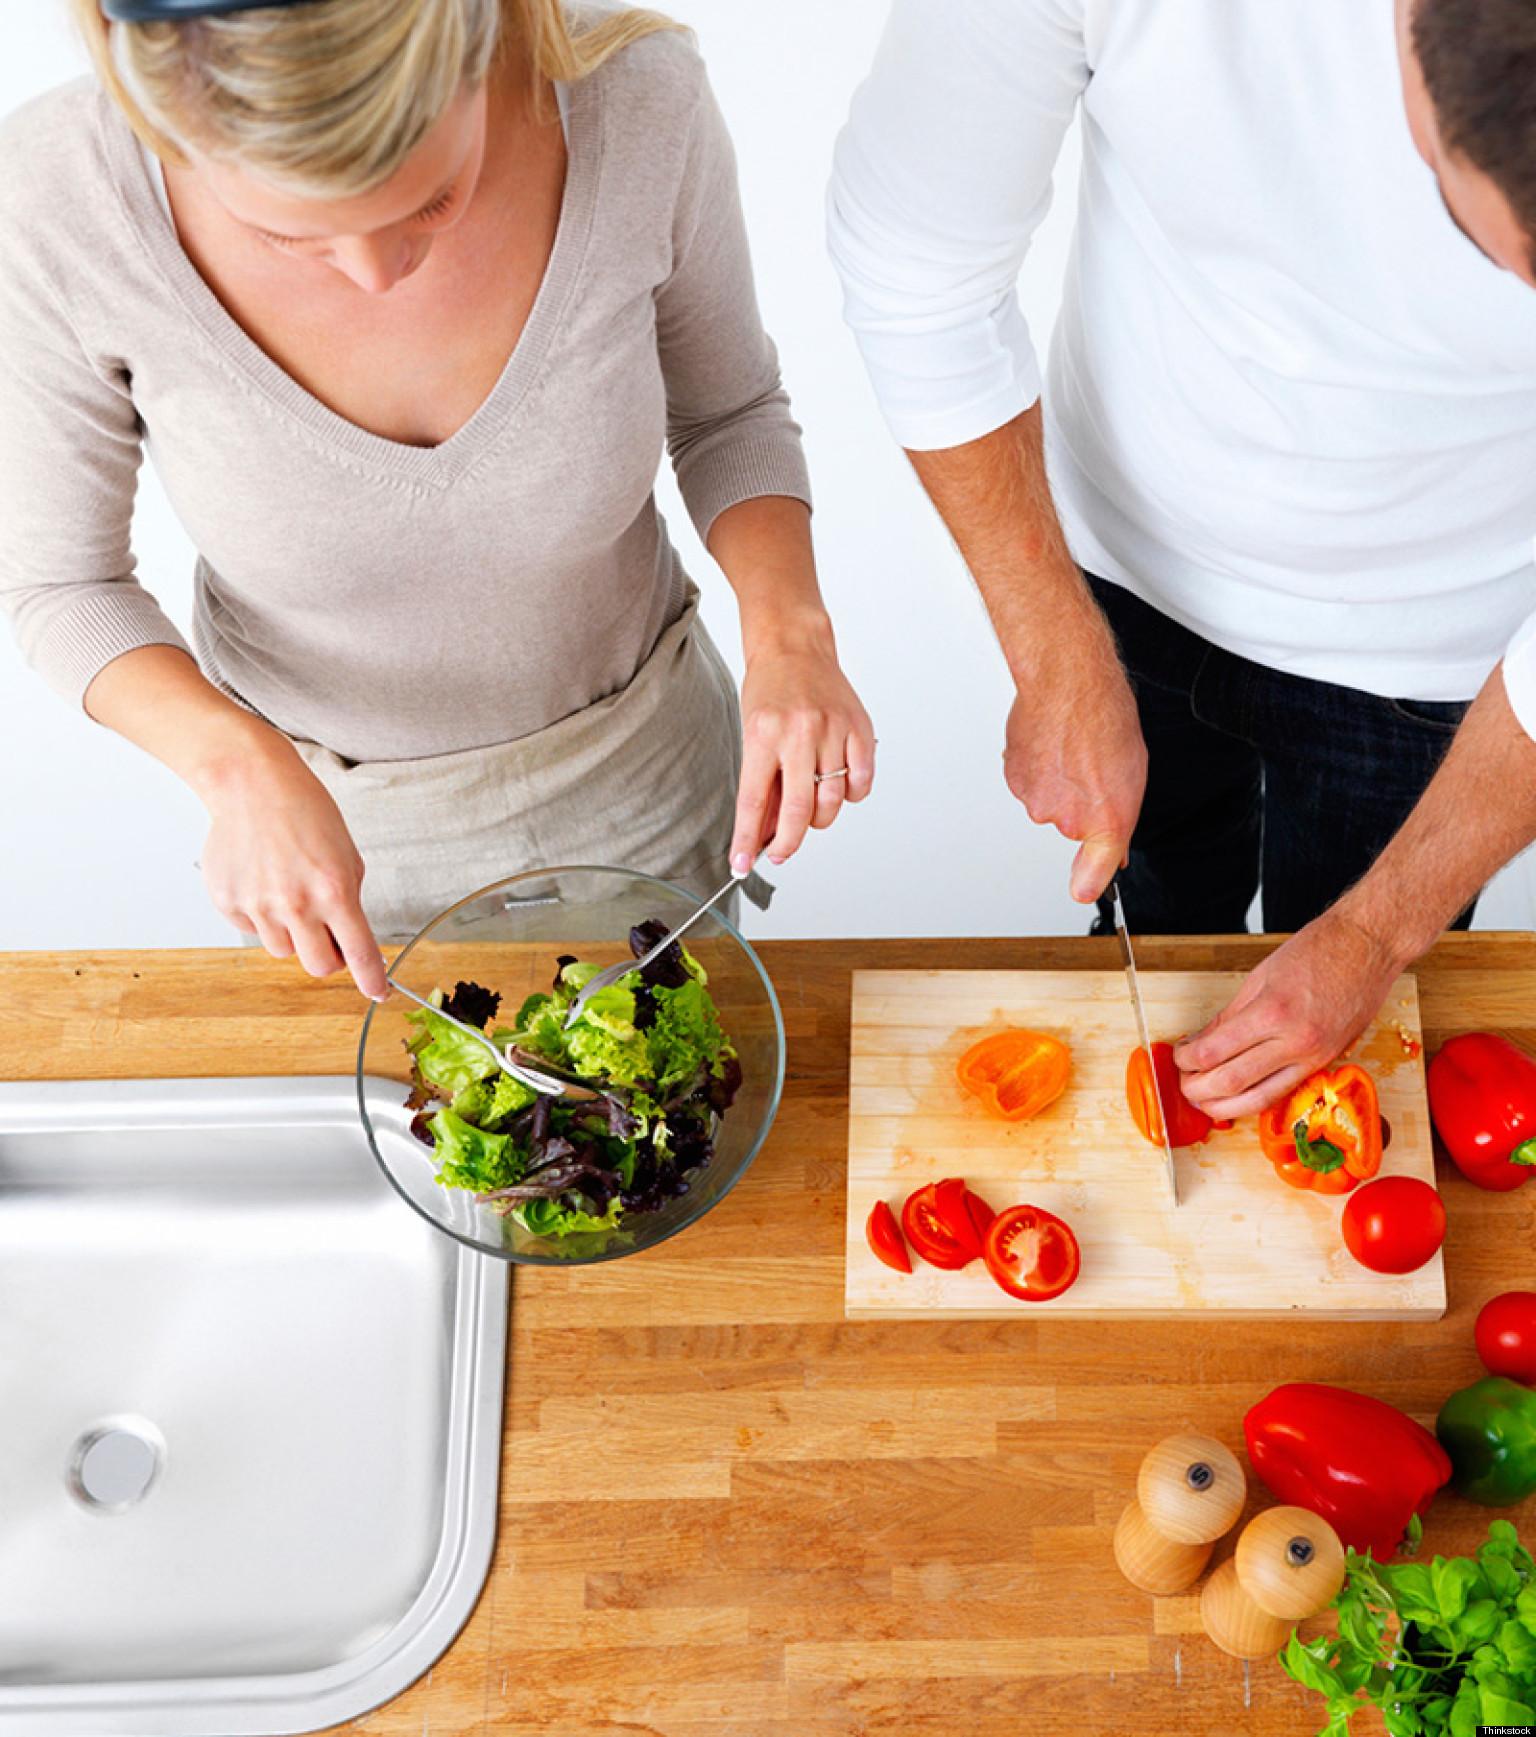 Cooking together-dating tips for men